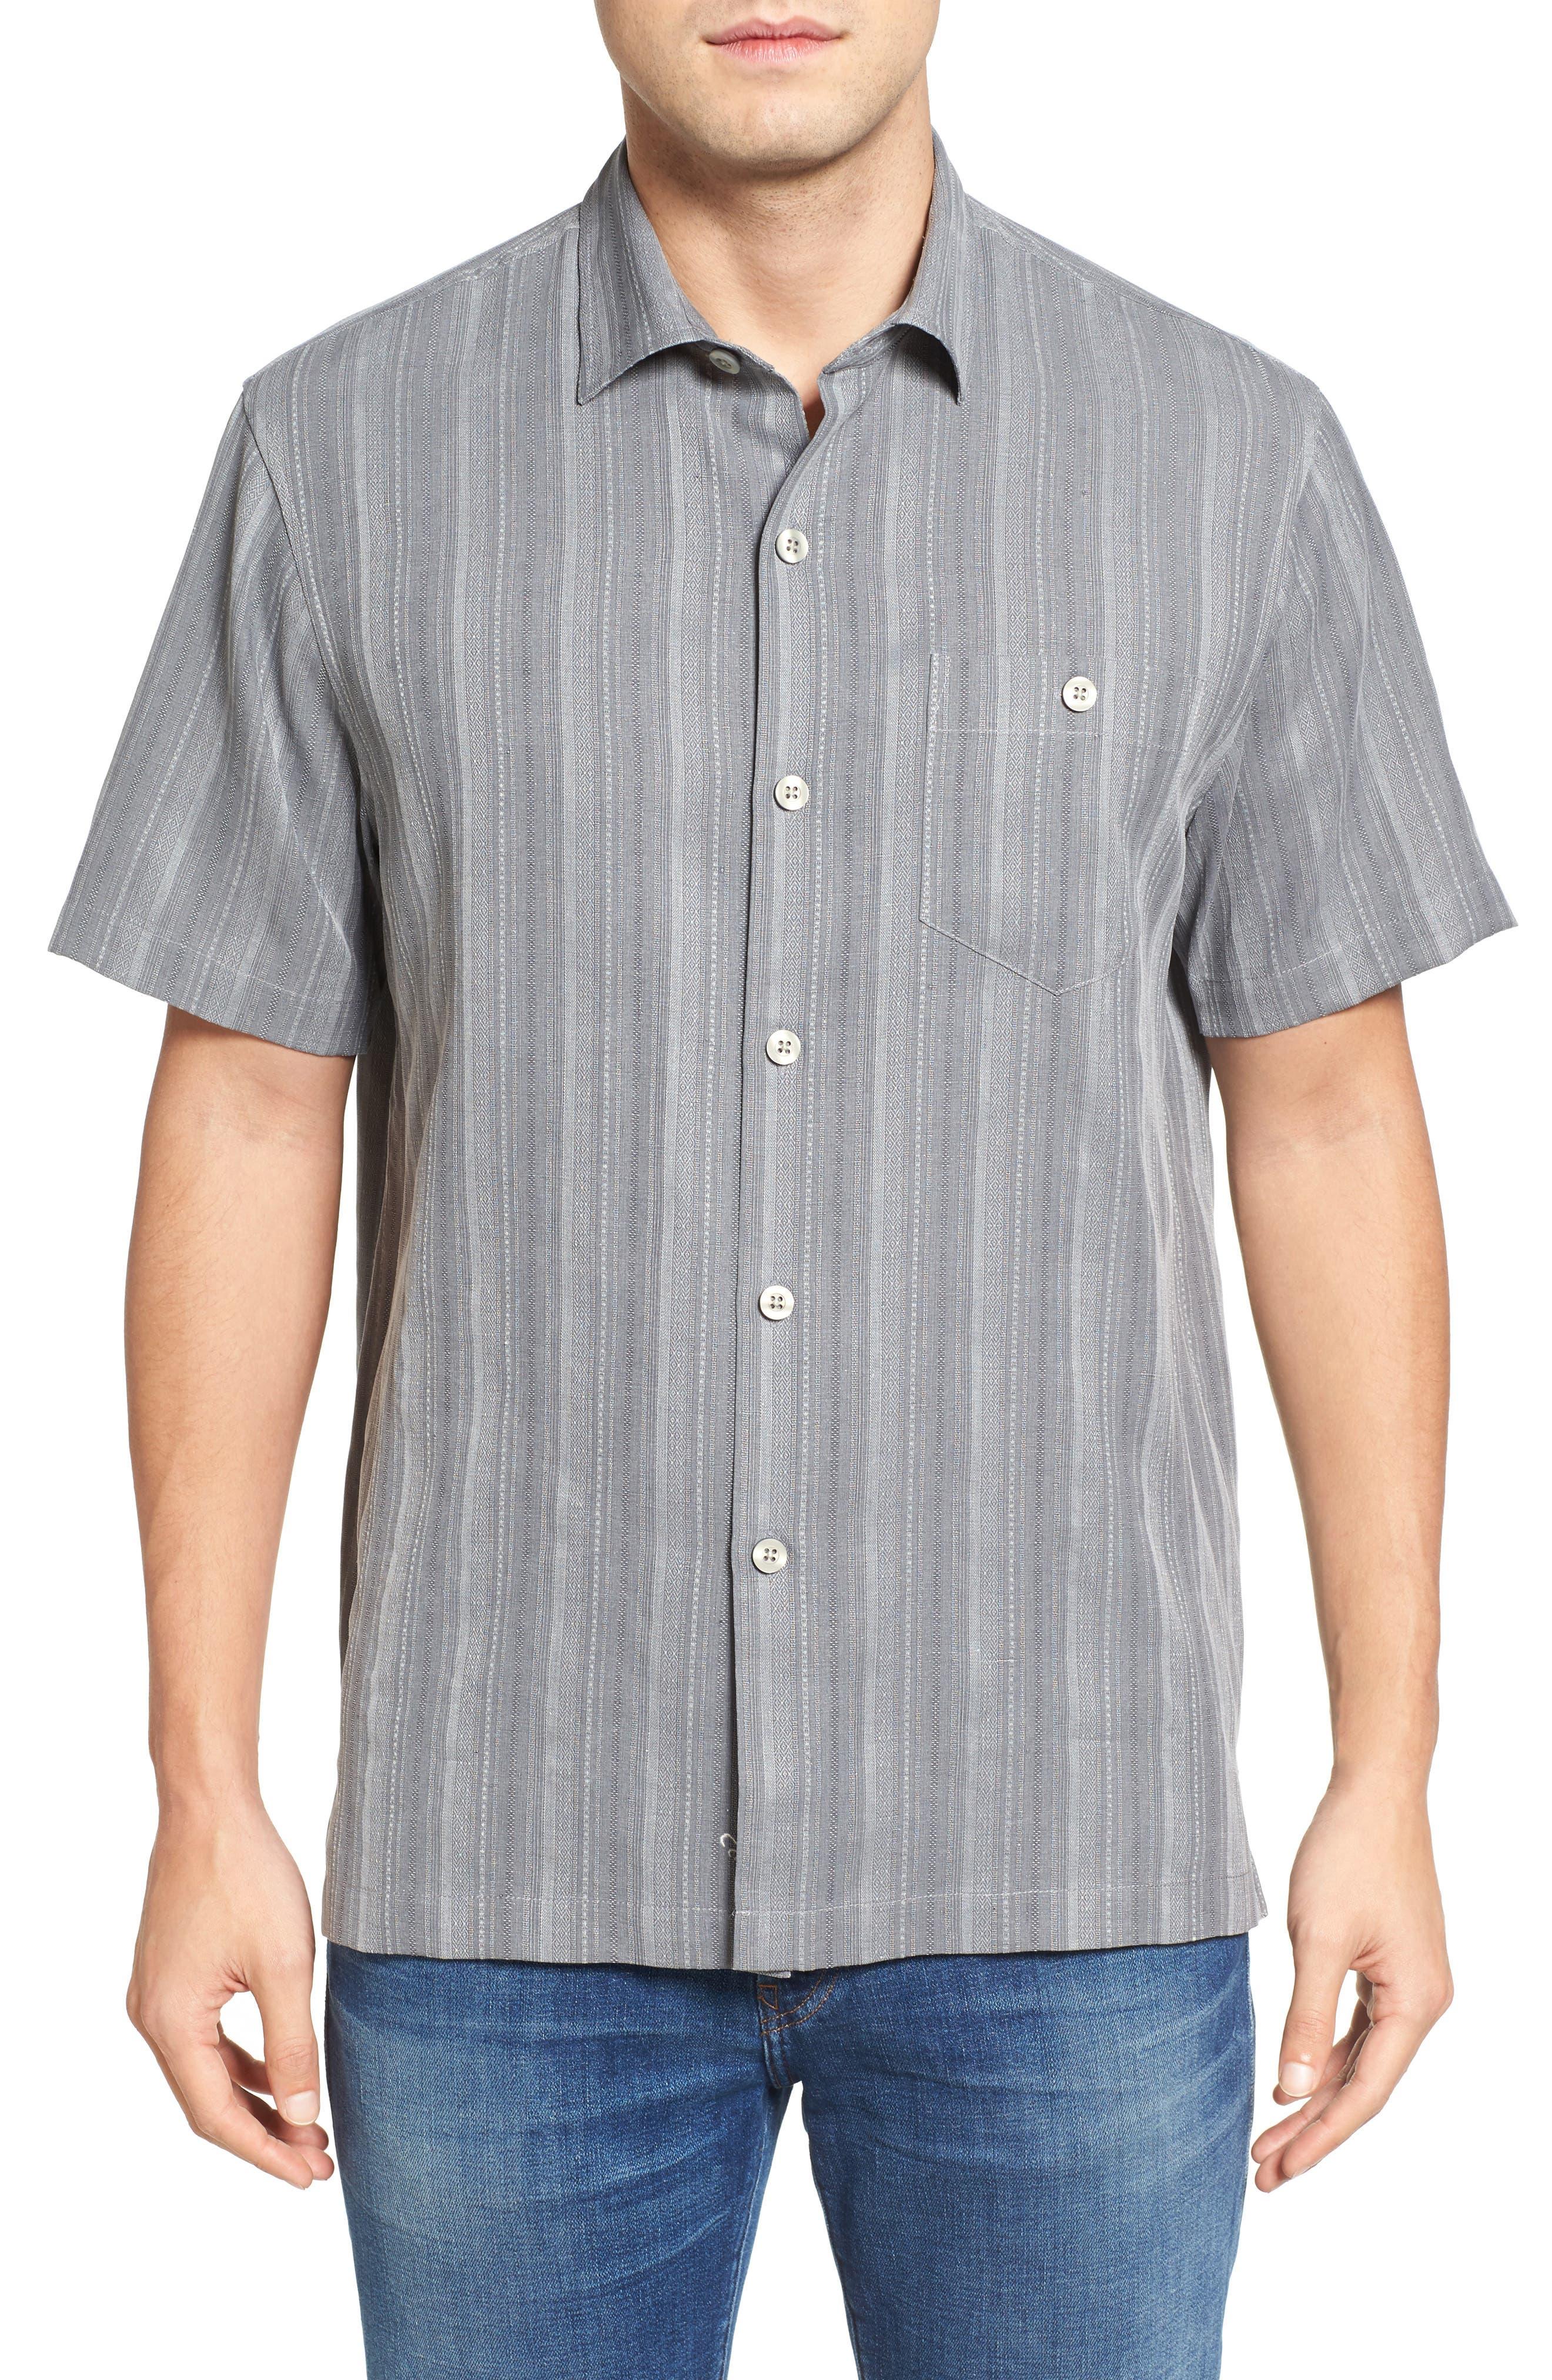 Zaldera Stripe Silk Camp Shirt,                             Main thumbnail 1, color,                             050